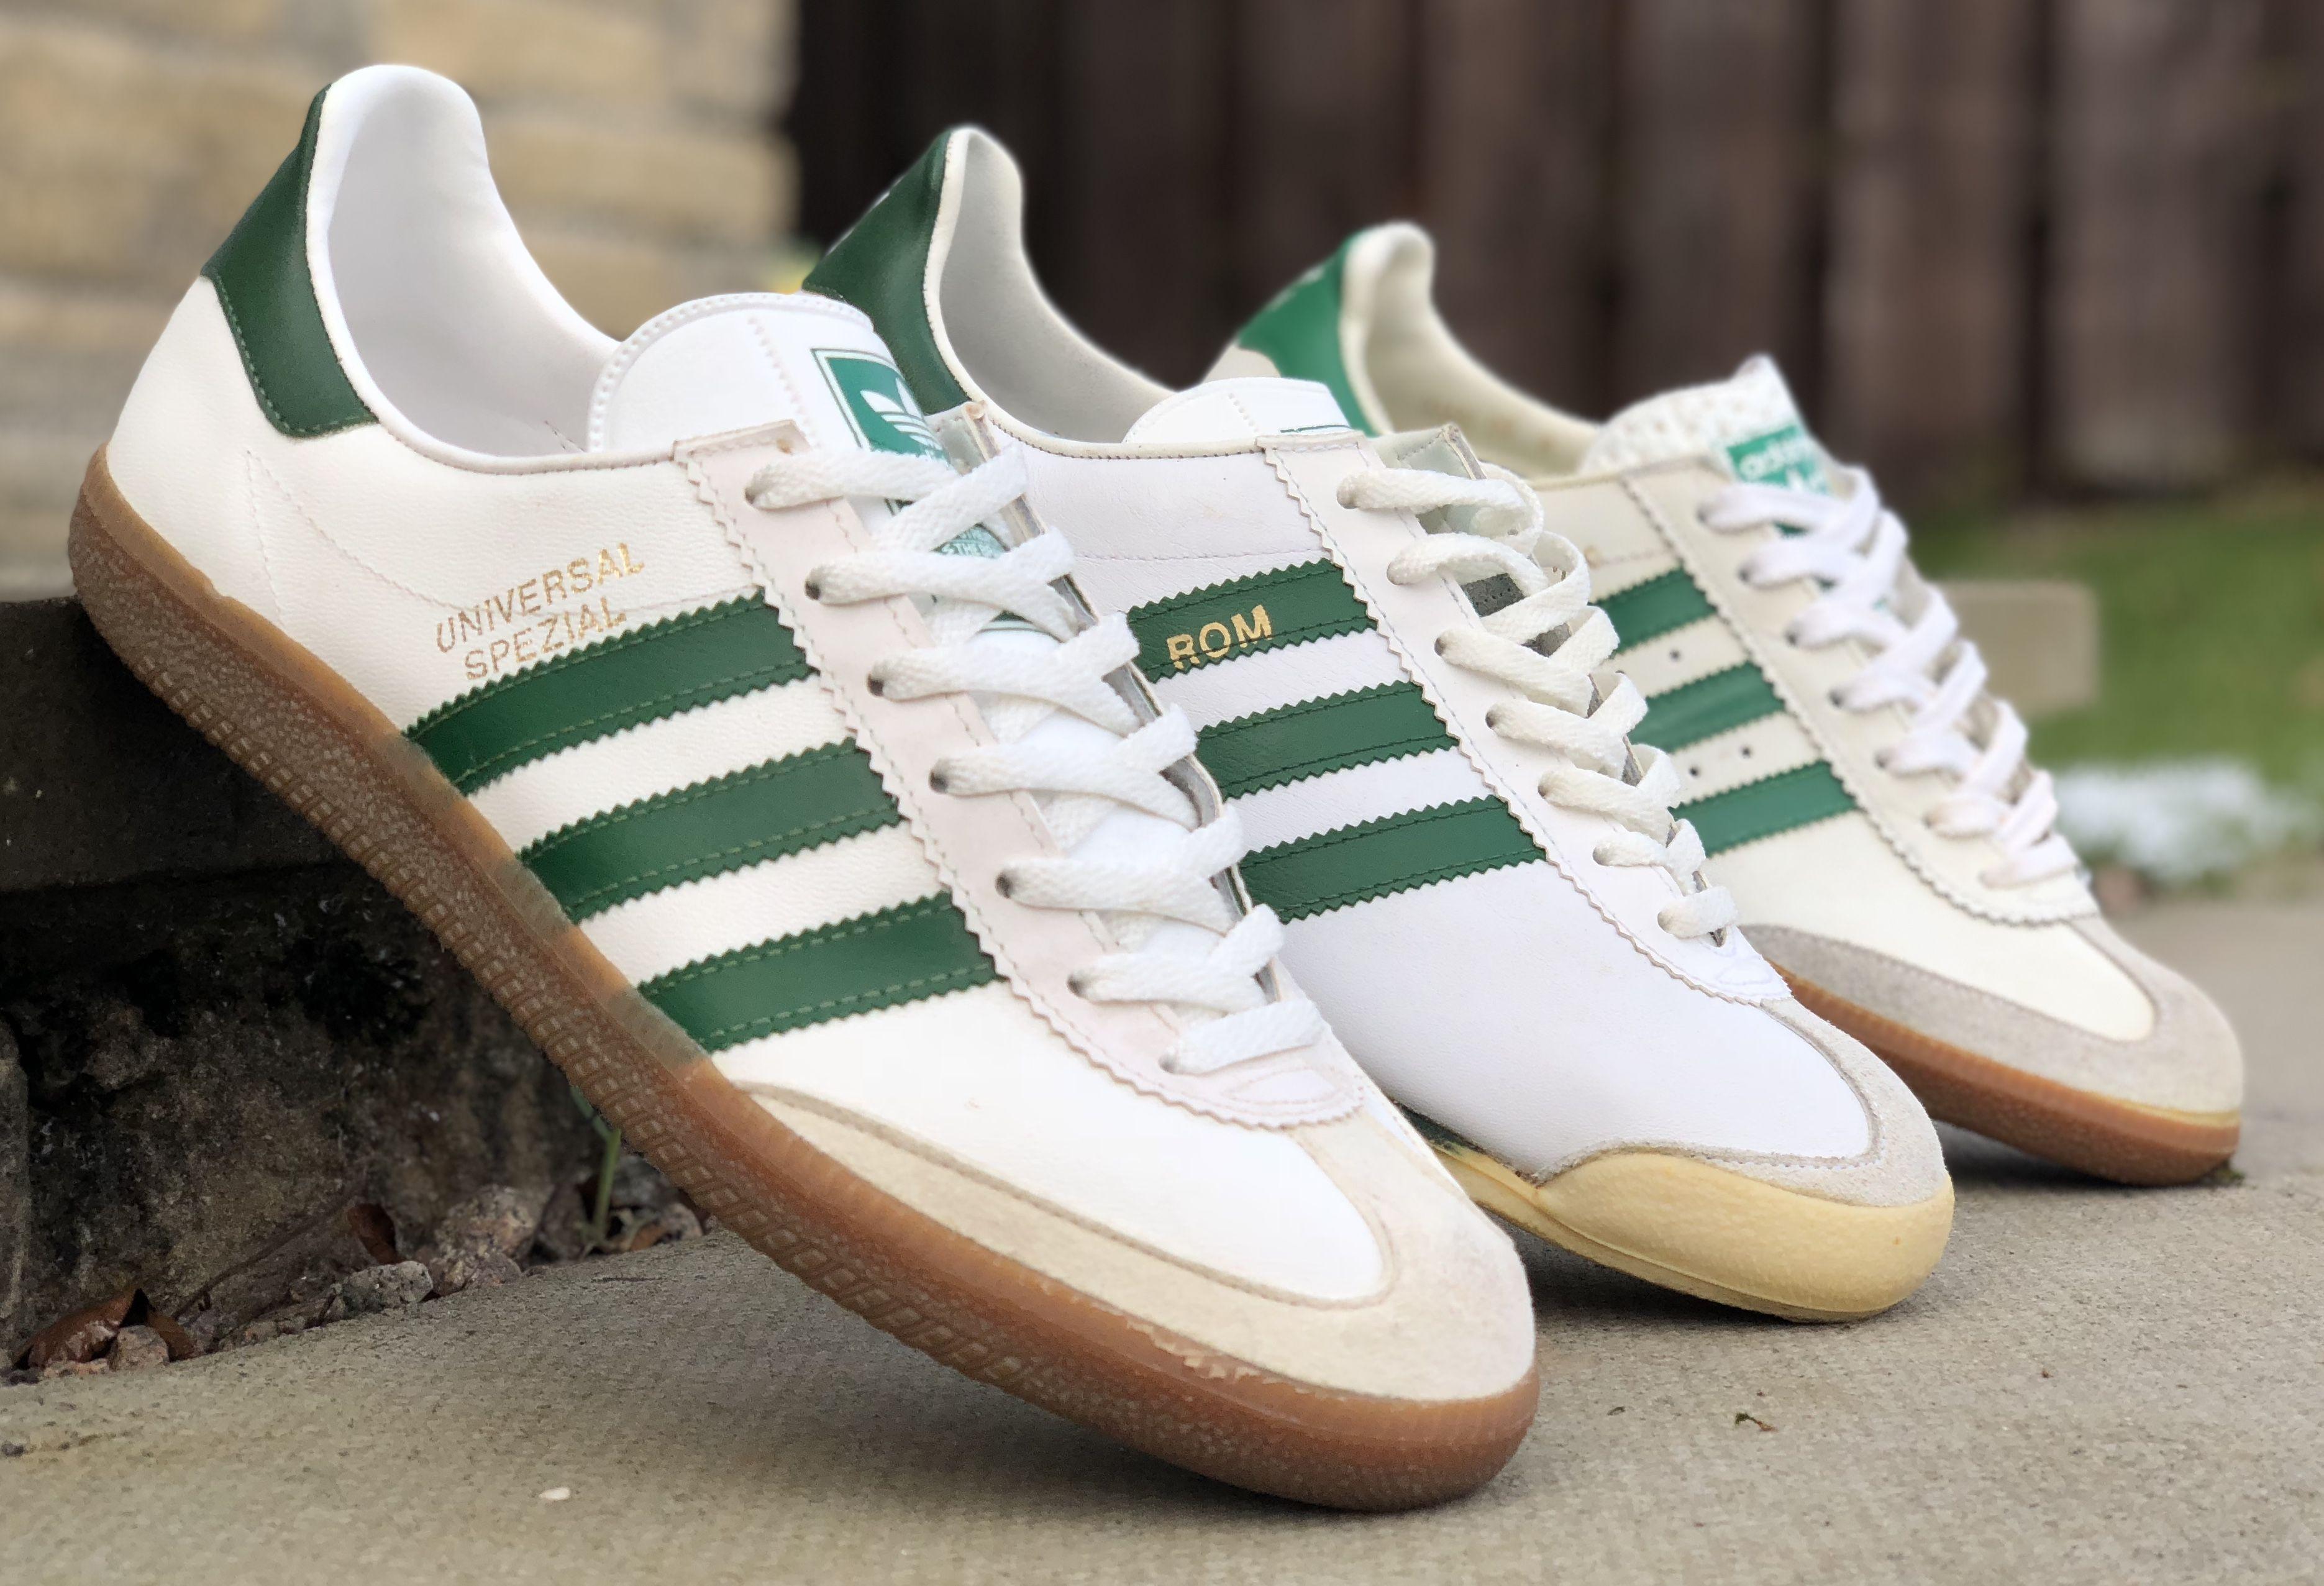 eaa9a90912c Adidas Universal Spezial Adidas Samba, Adidas Superstar, Adidas Sneakers,  Trainers, Adidas Shoes